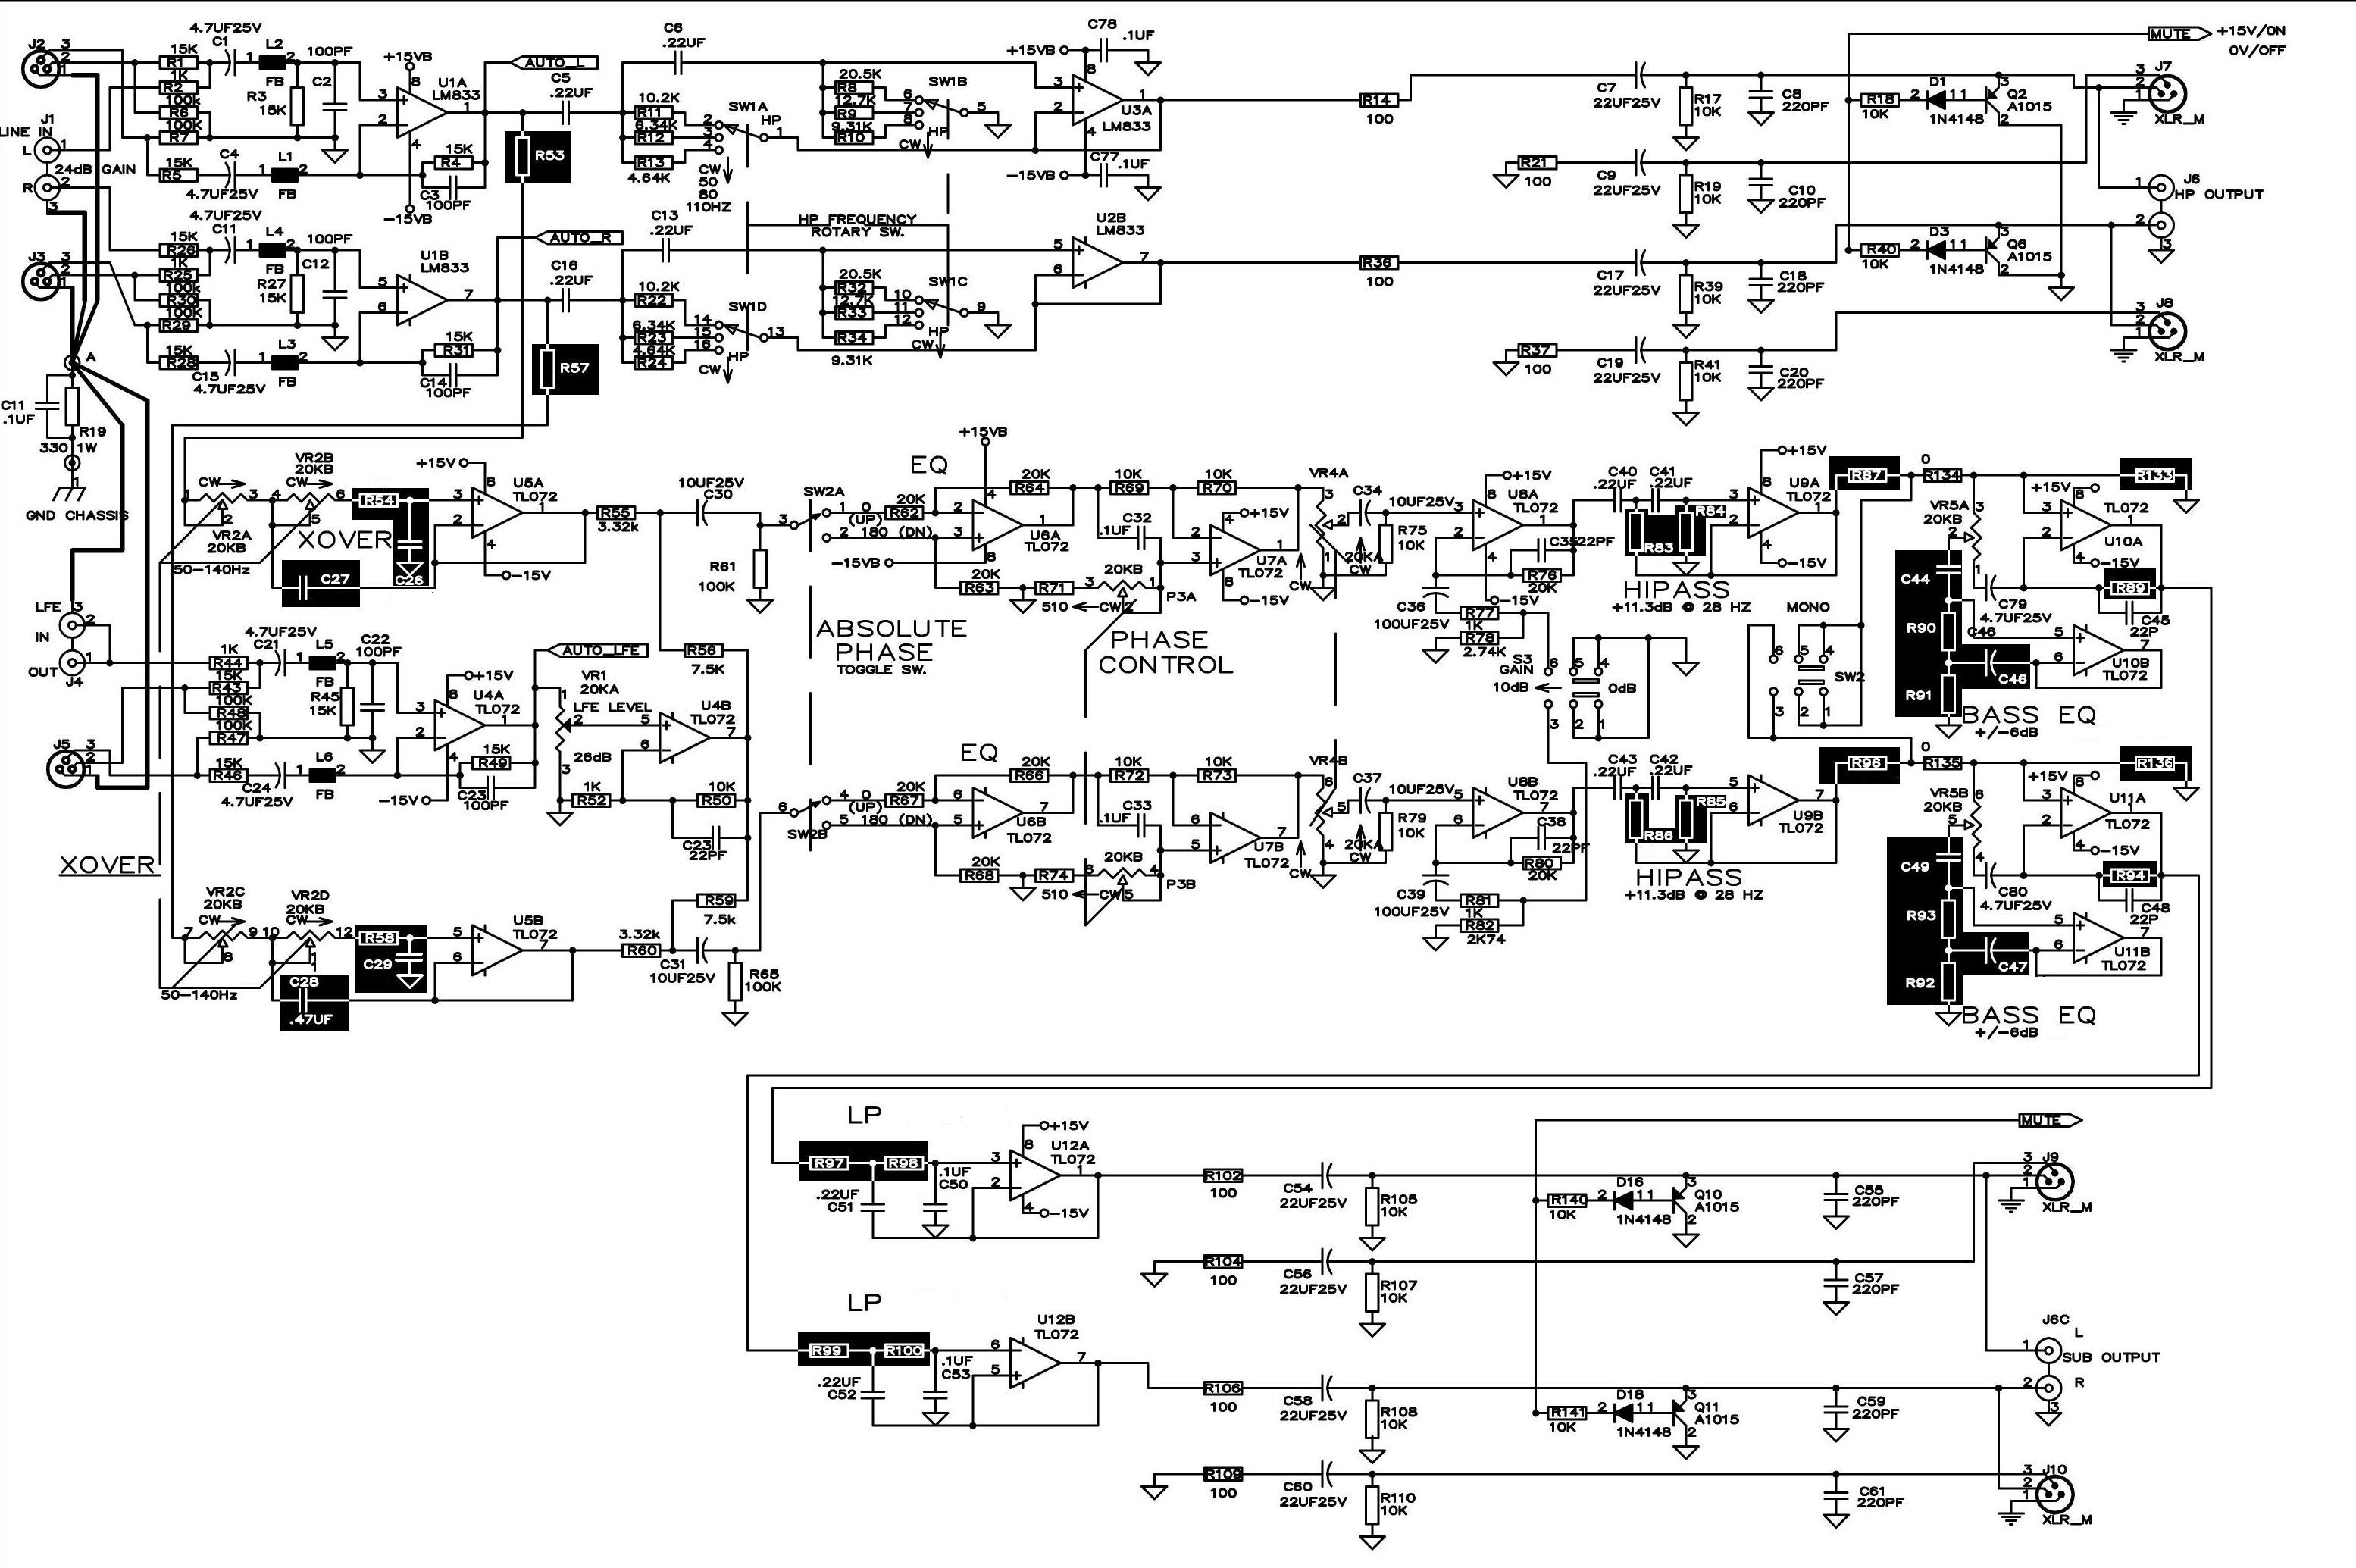 Organ Schematic Diagrams Furthermore Speaker Crossover Schematic